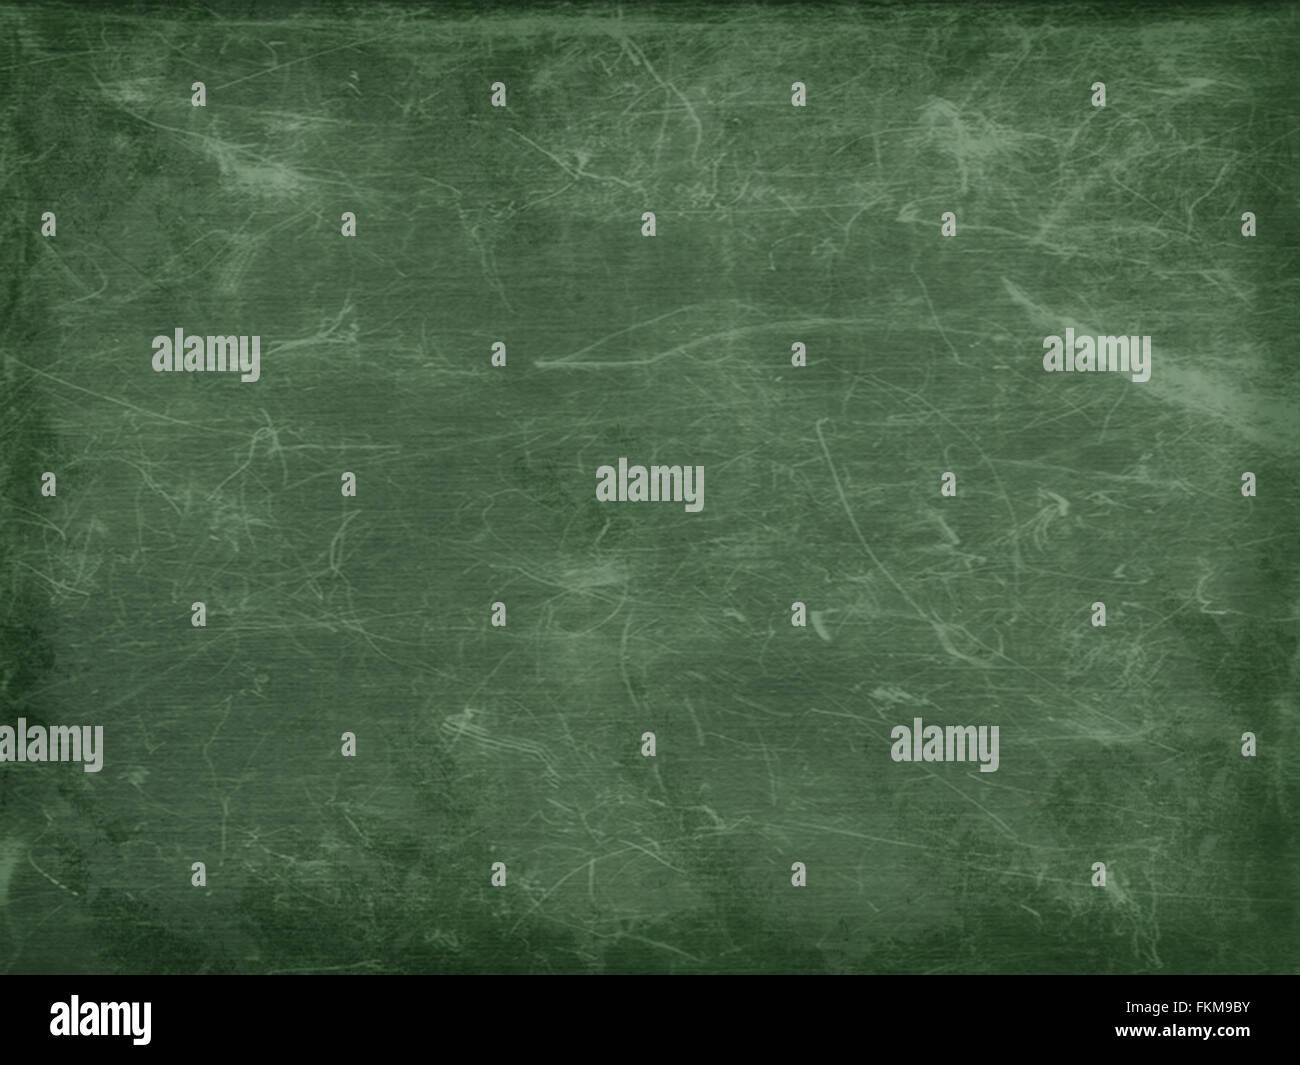 Full Frame Blank Green Chalkboard Background With Vignette